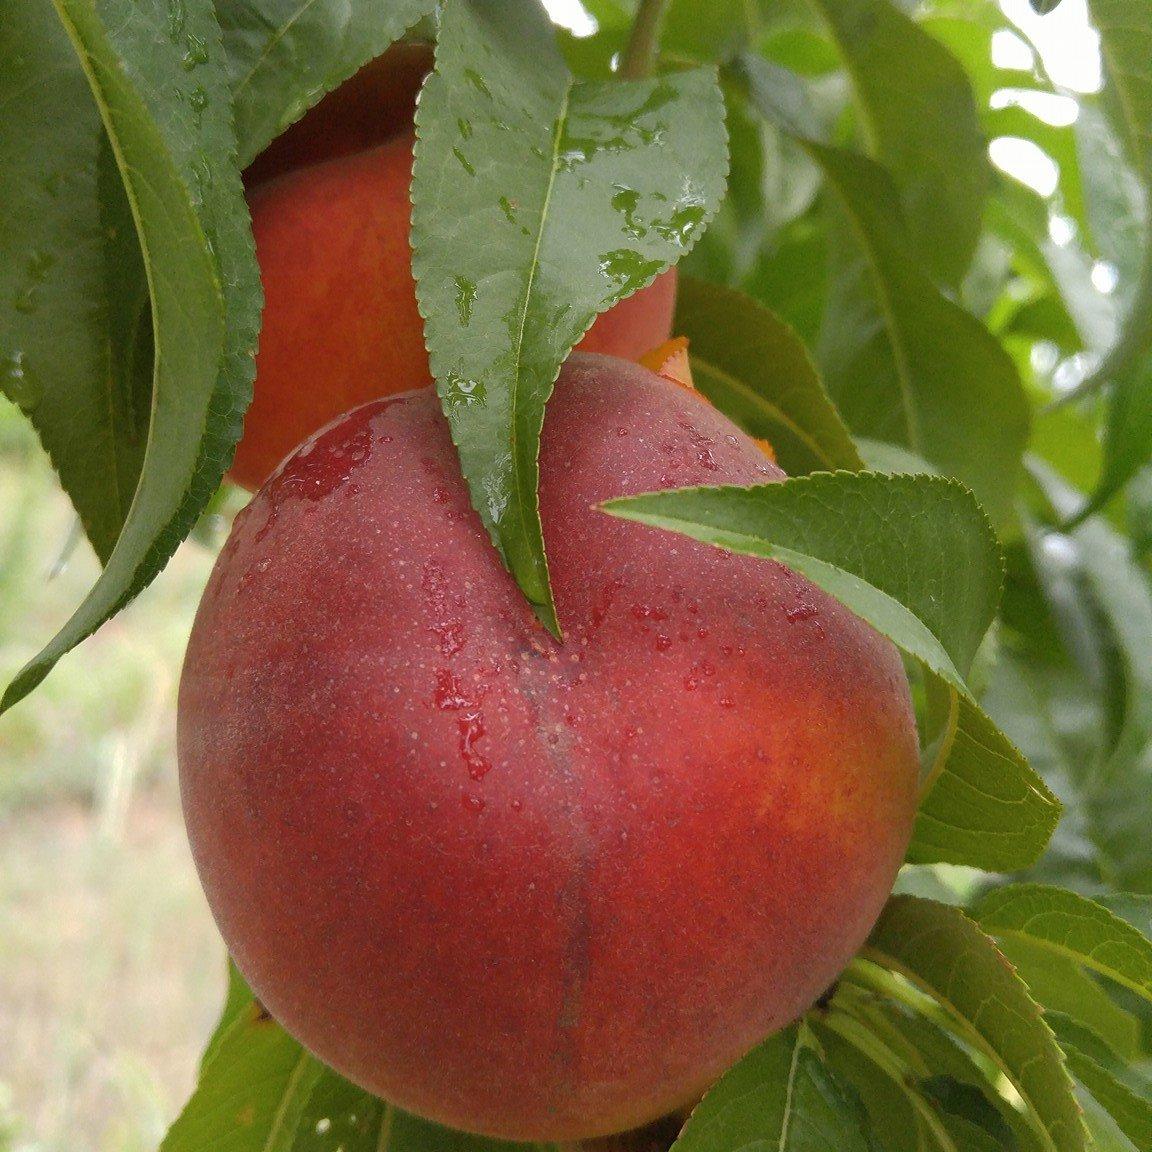 Forbidden Fruit Orchard